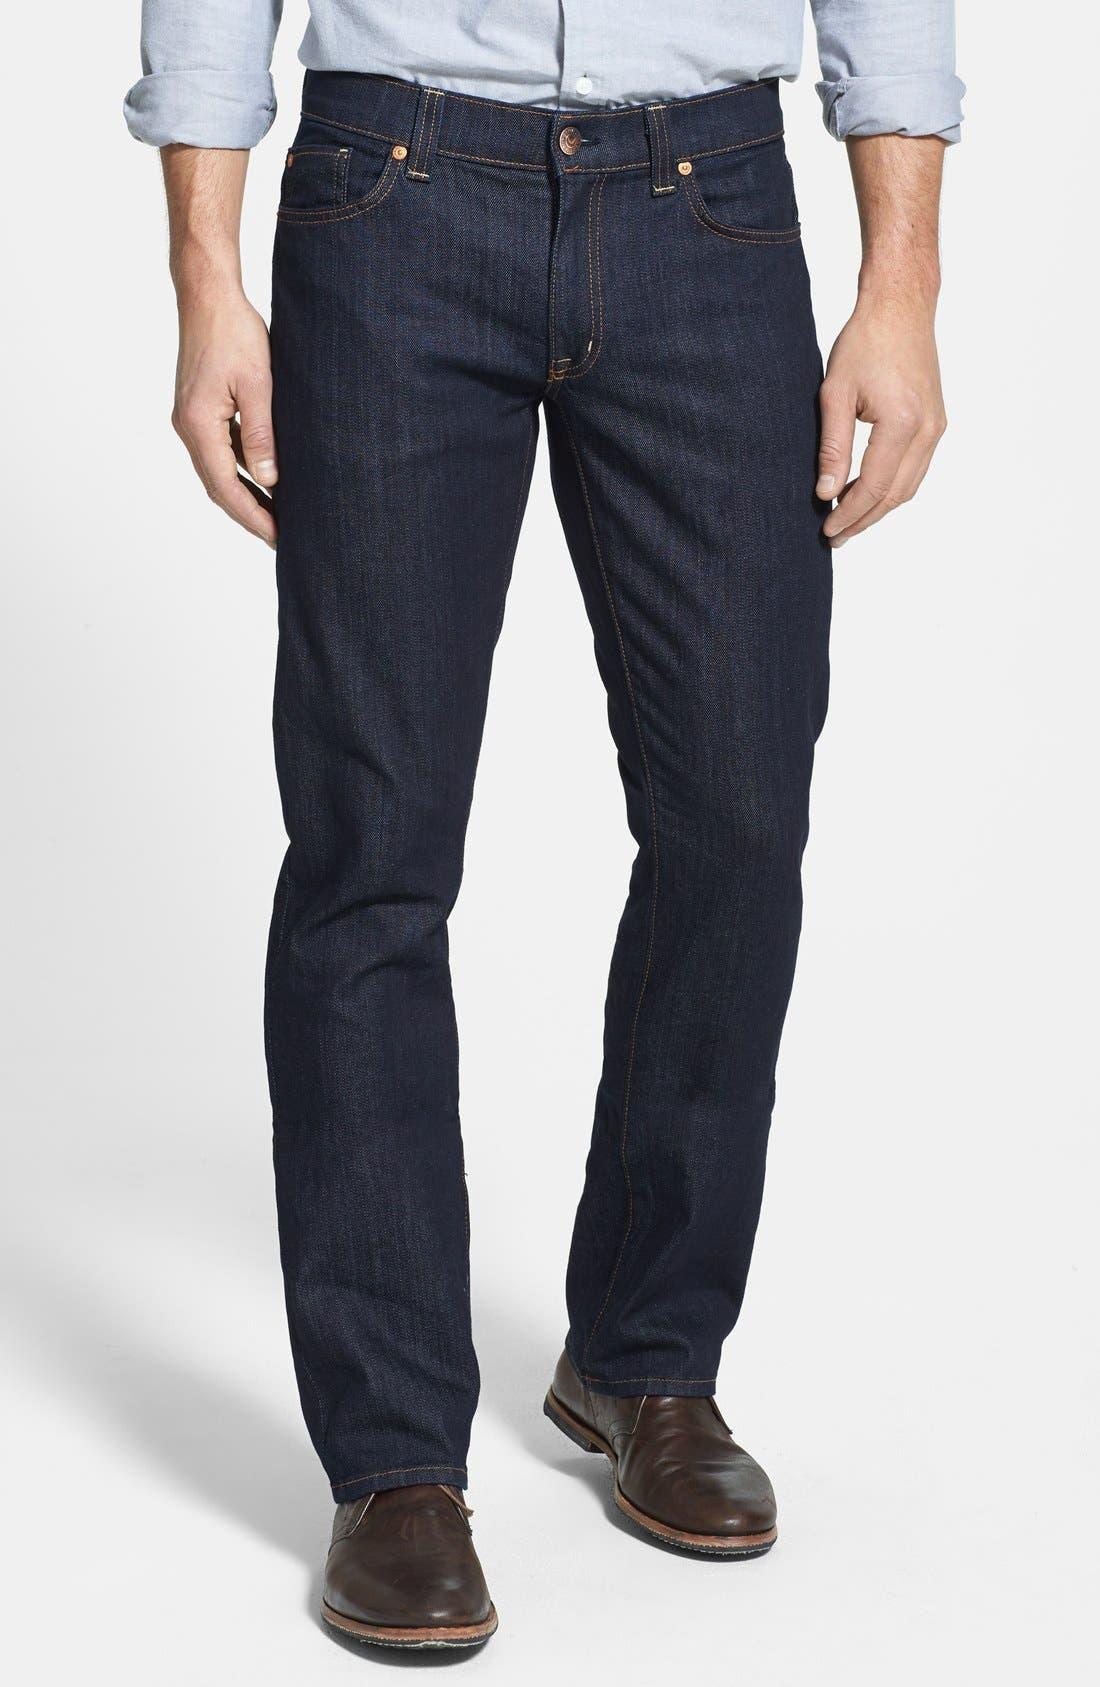 Alternate Image 1 Selected - Fidelity Denim 'Impala' Straight Leg Jeans (Town Rinse)